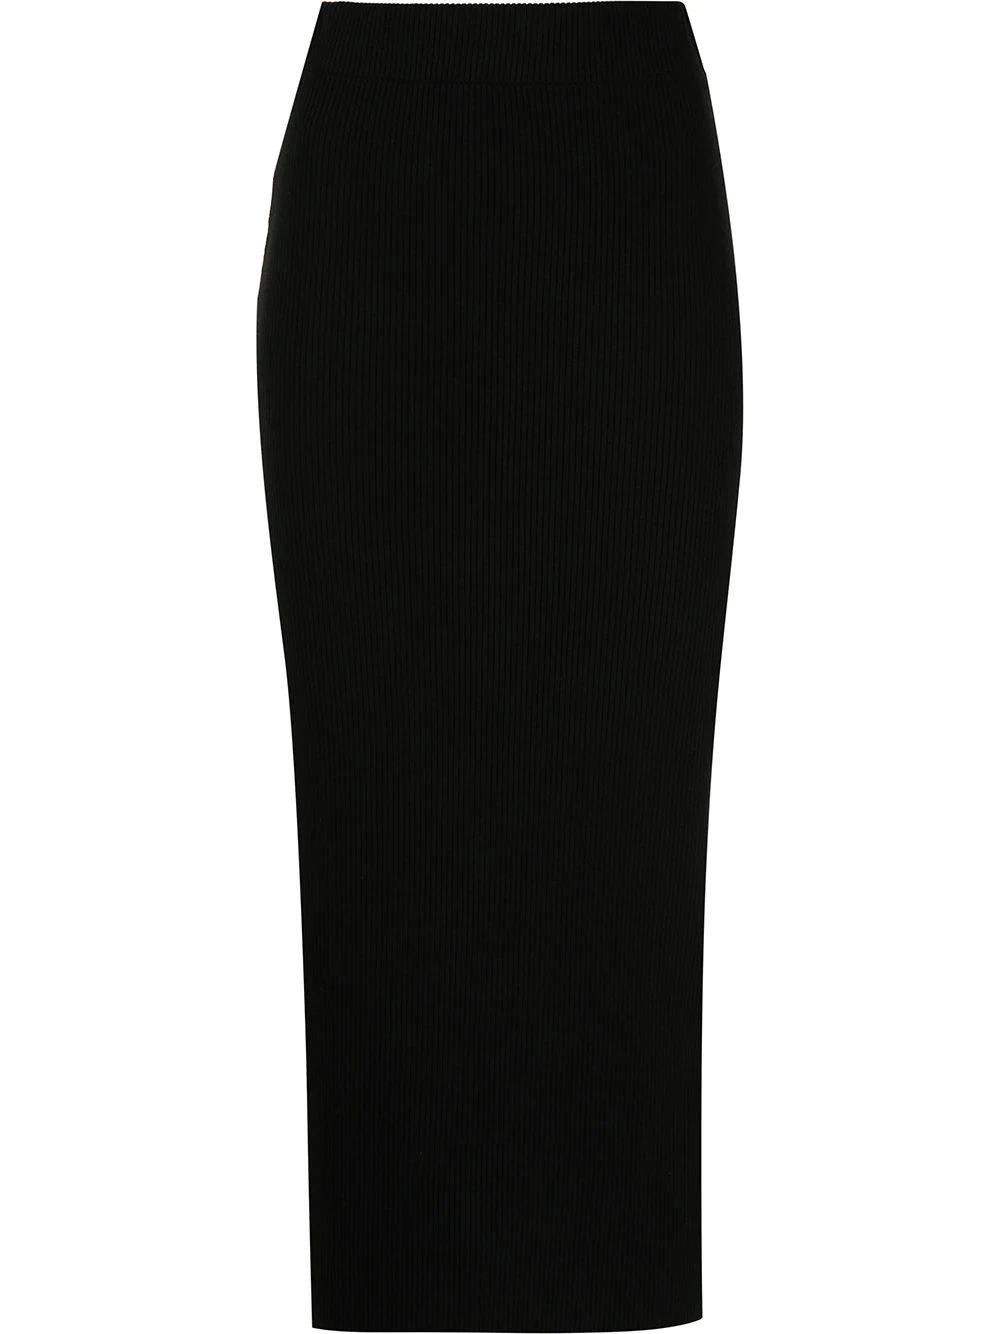 Ribbed Pencil Skirt Item # V735983668